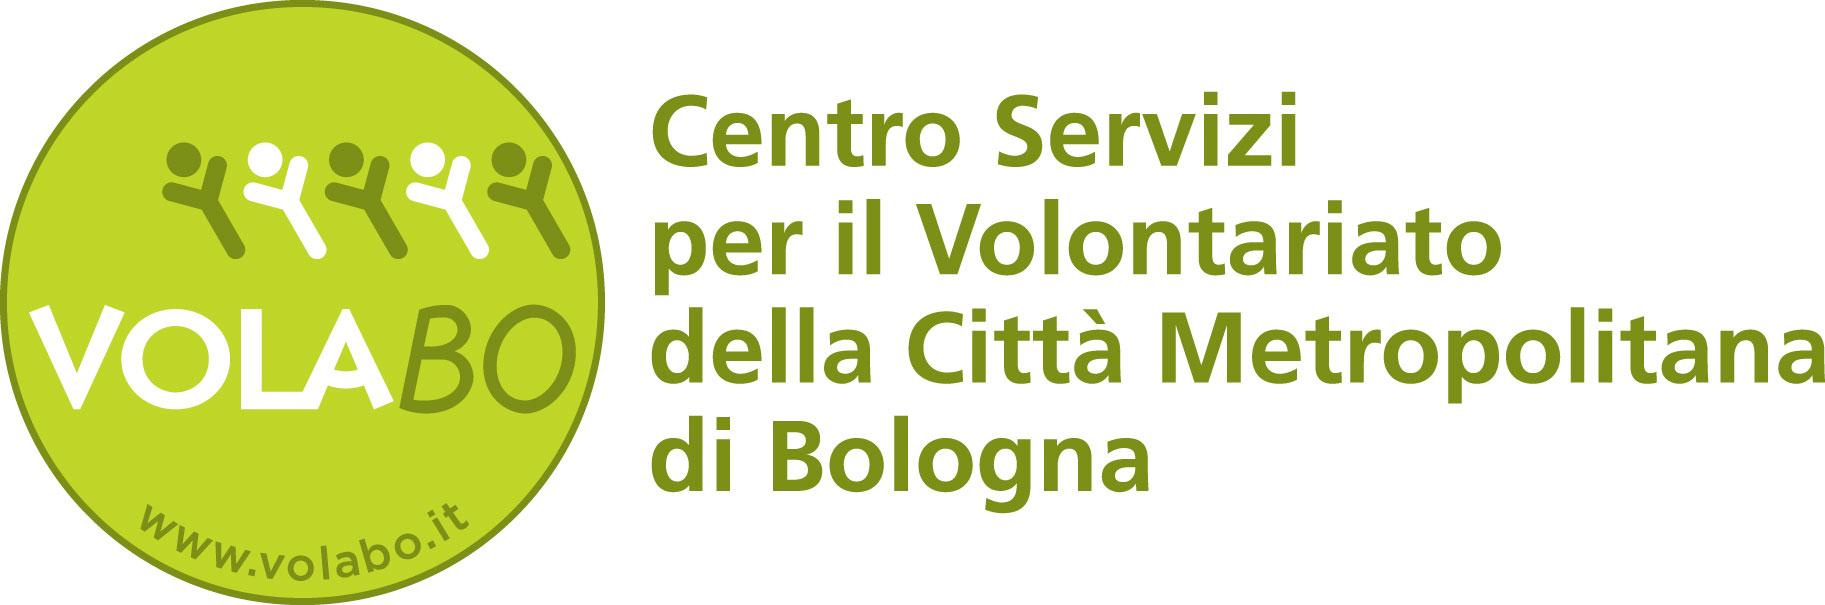 www.volabo.it